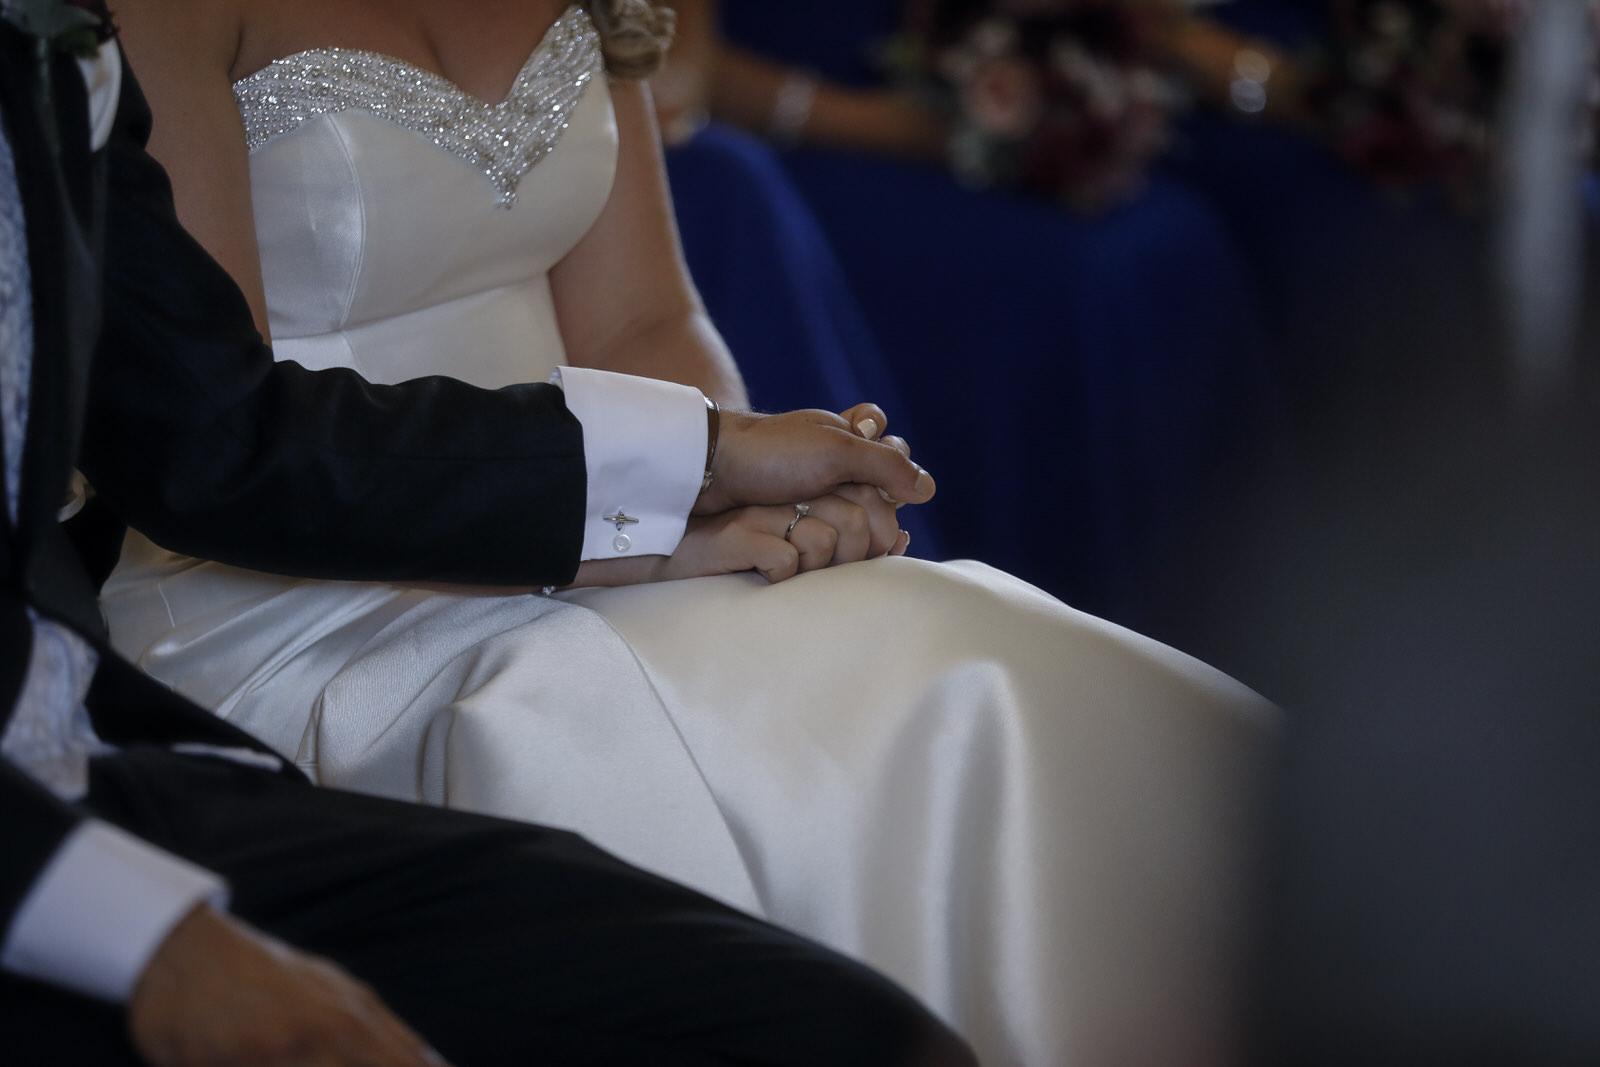 darver_castle_wedding_photographer_goldenmonentsweddingphotography_a226.jpg